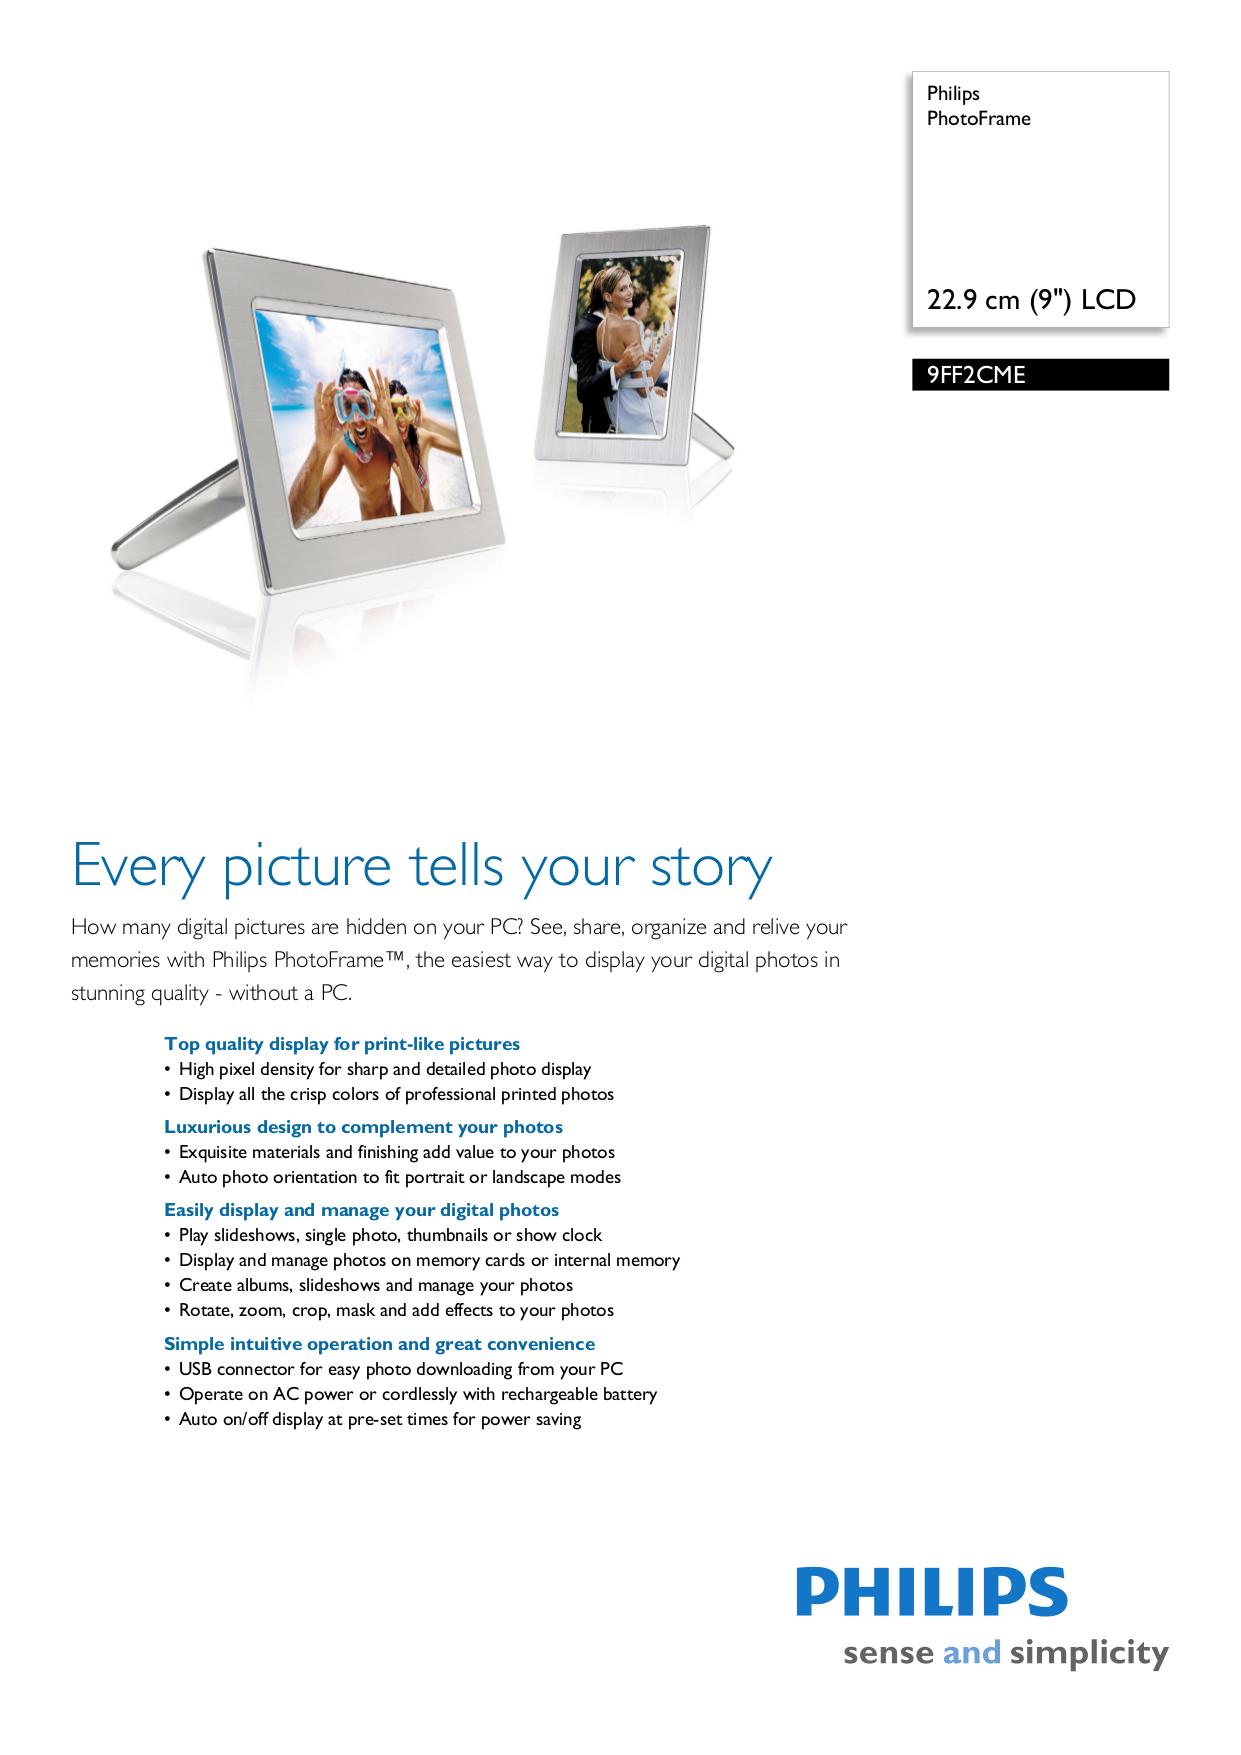 philips digital photo frame 9ff2 manual